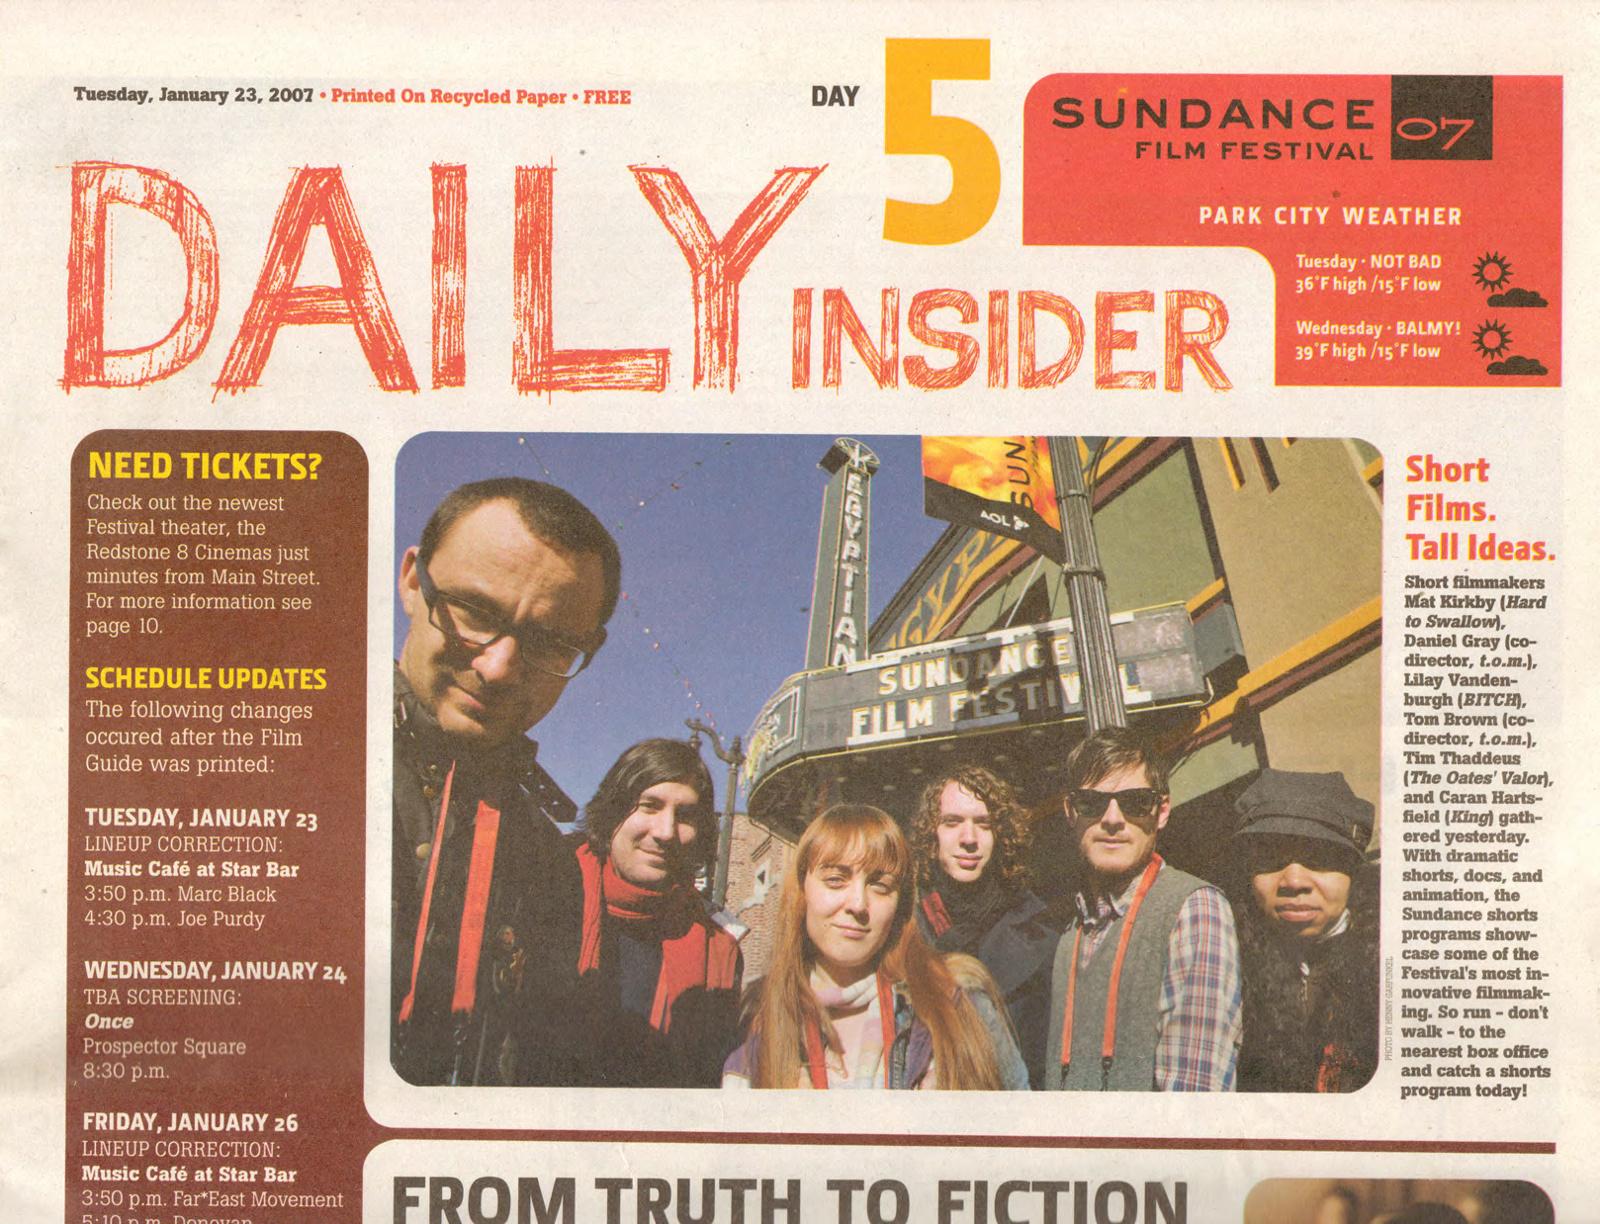 85f71ec277ddf5f7-Sundance